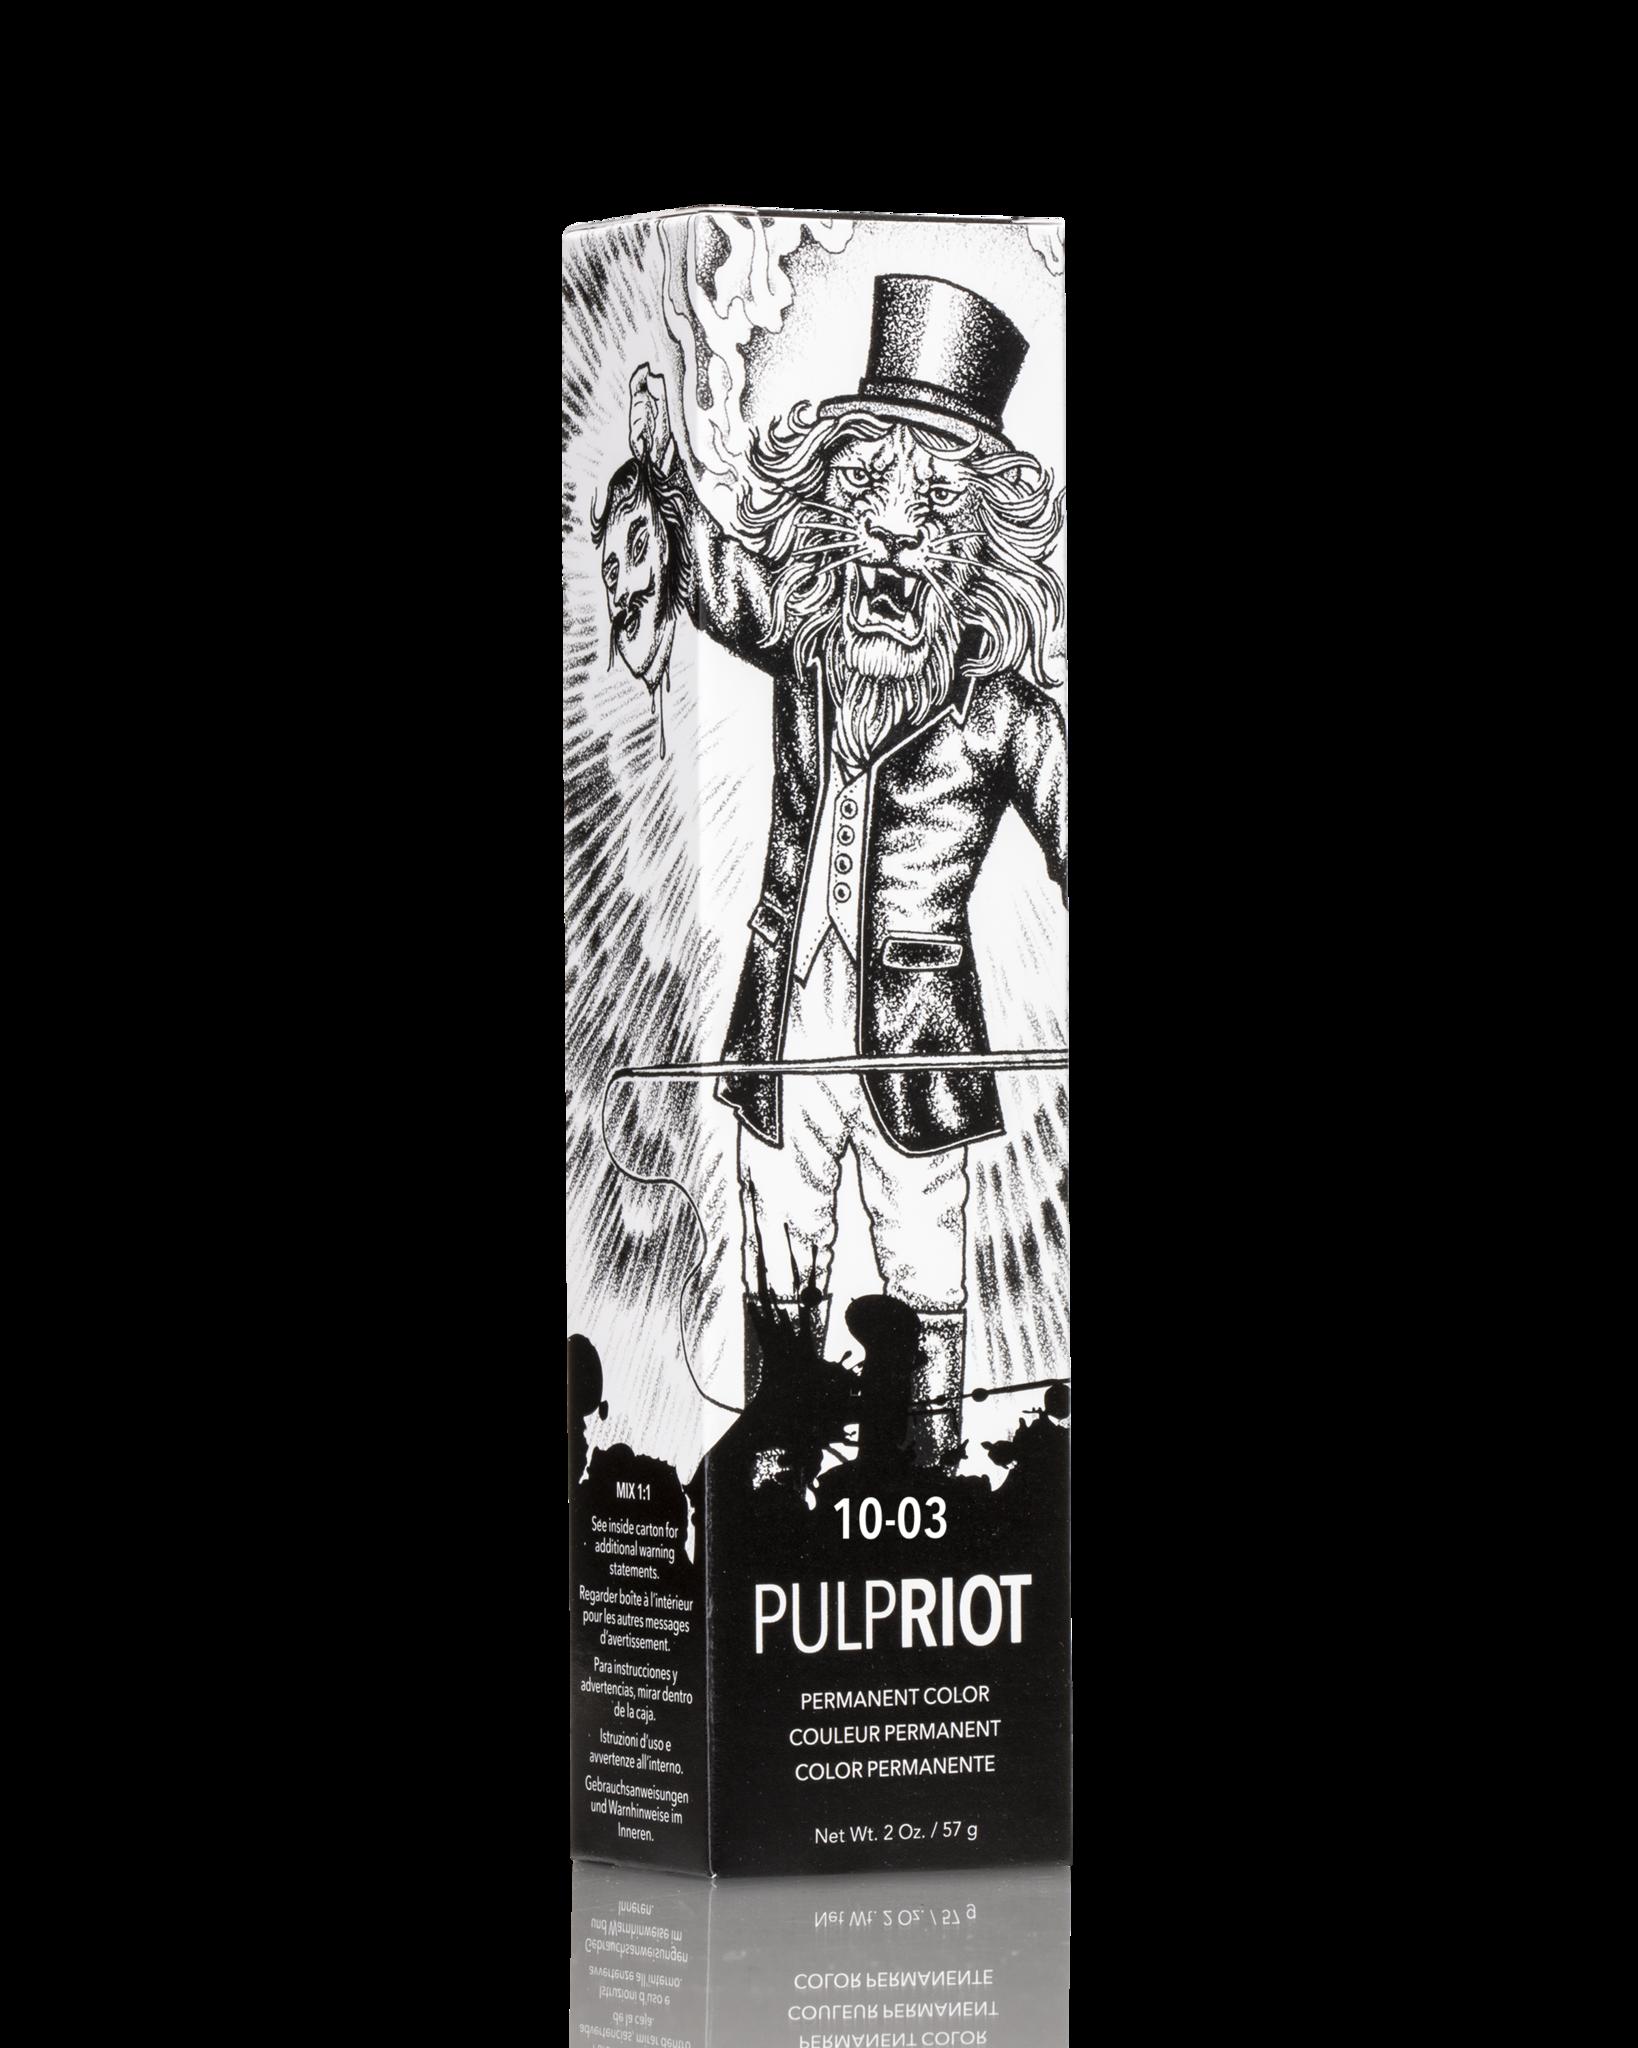 Pulp Riot PULP RIOT FACTION 8 NATUREL DORÉ/NATUREL GOLD 10-03